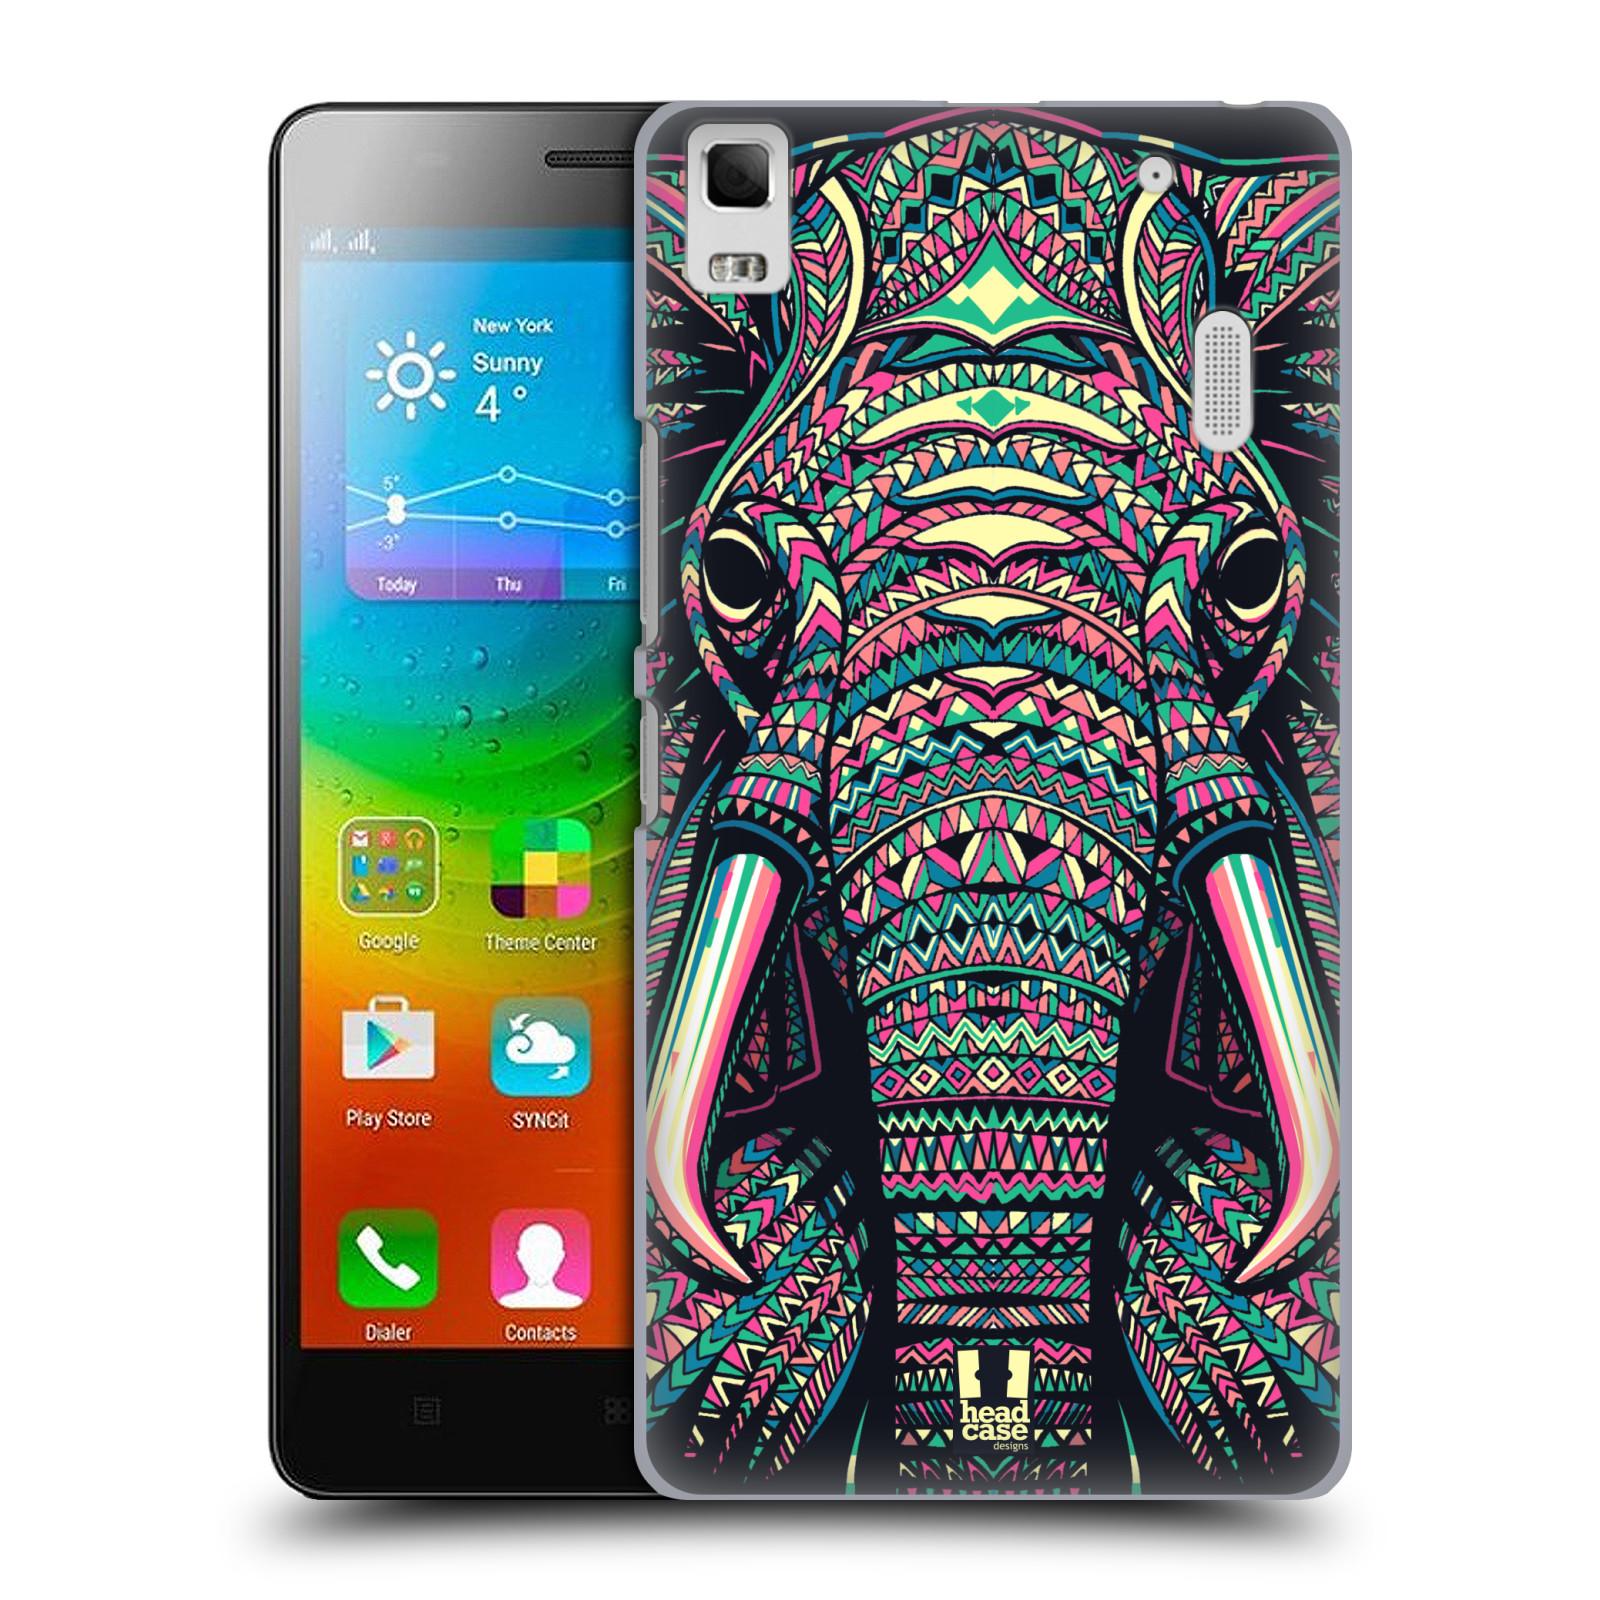 HEAD CASE pevný plastový obal na mobil LENOVO A7000 / A7000 DUAL / K3 NOTE vzor Aztécký motiv zvíře 2 slon